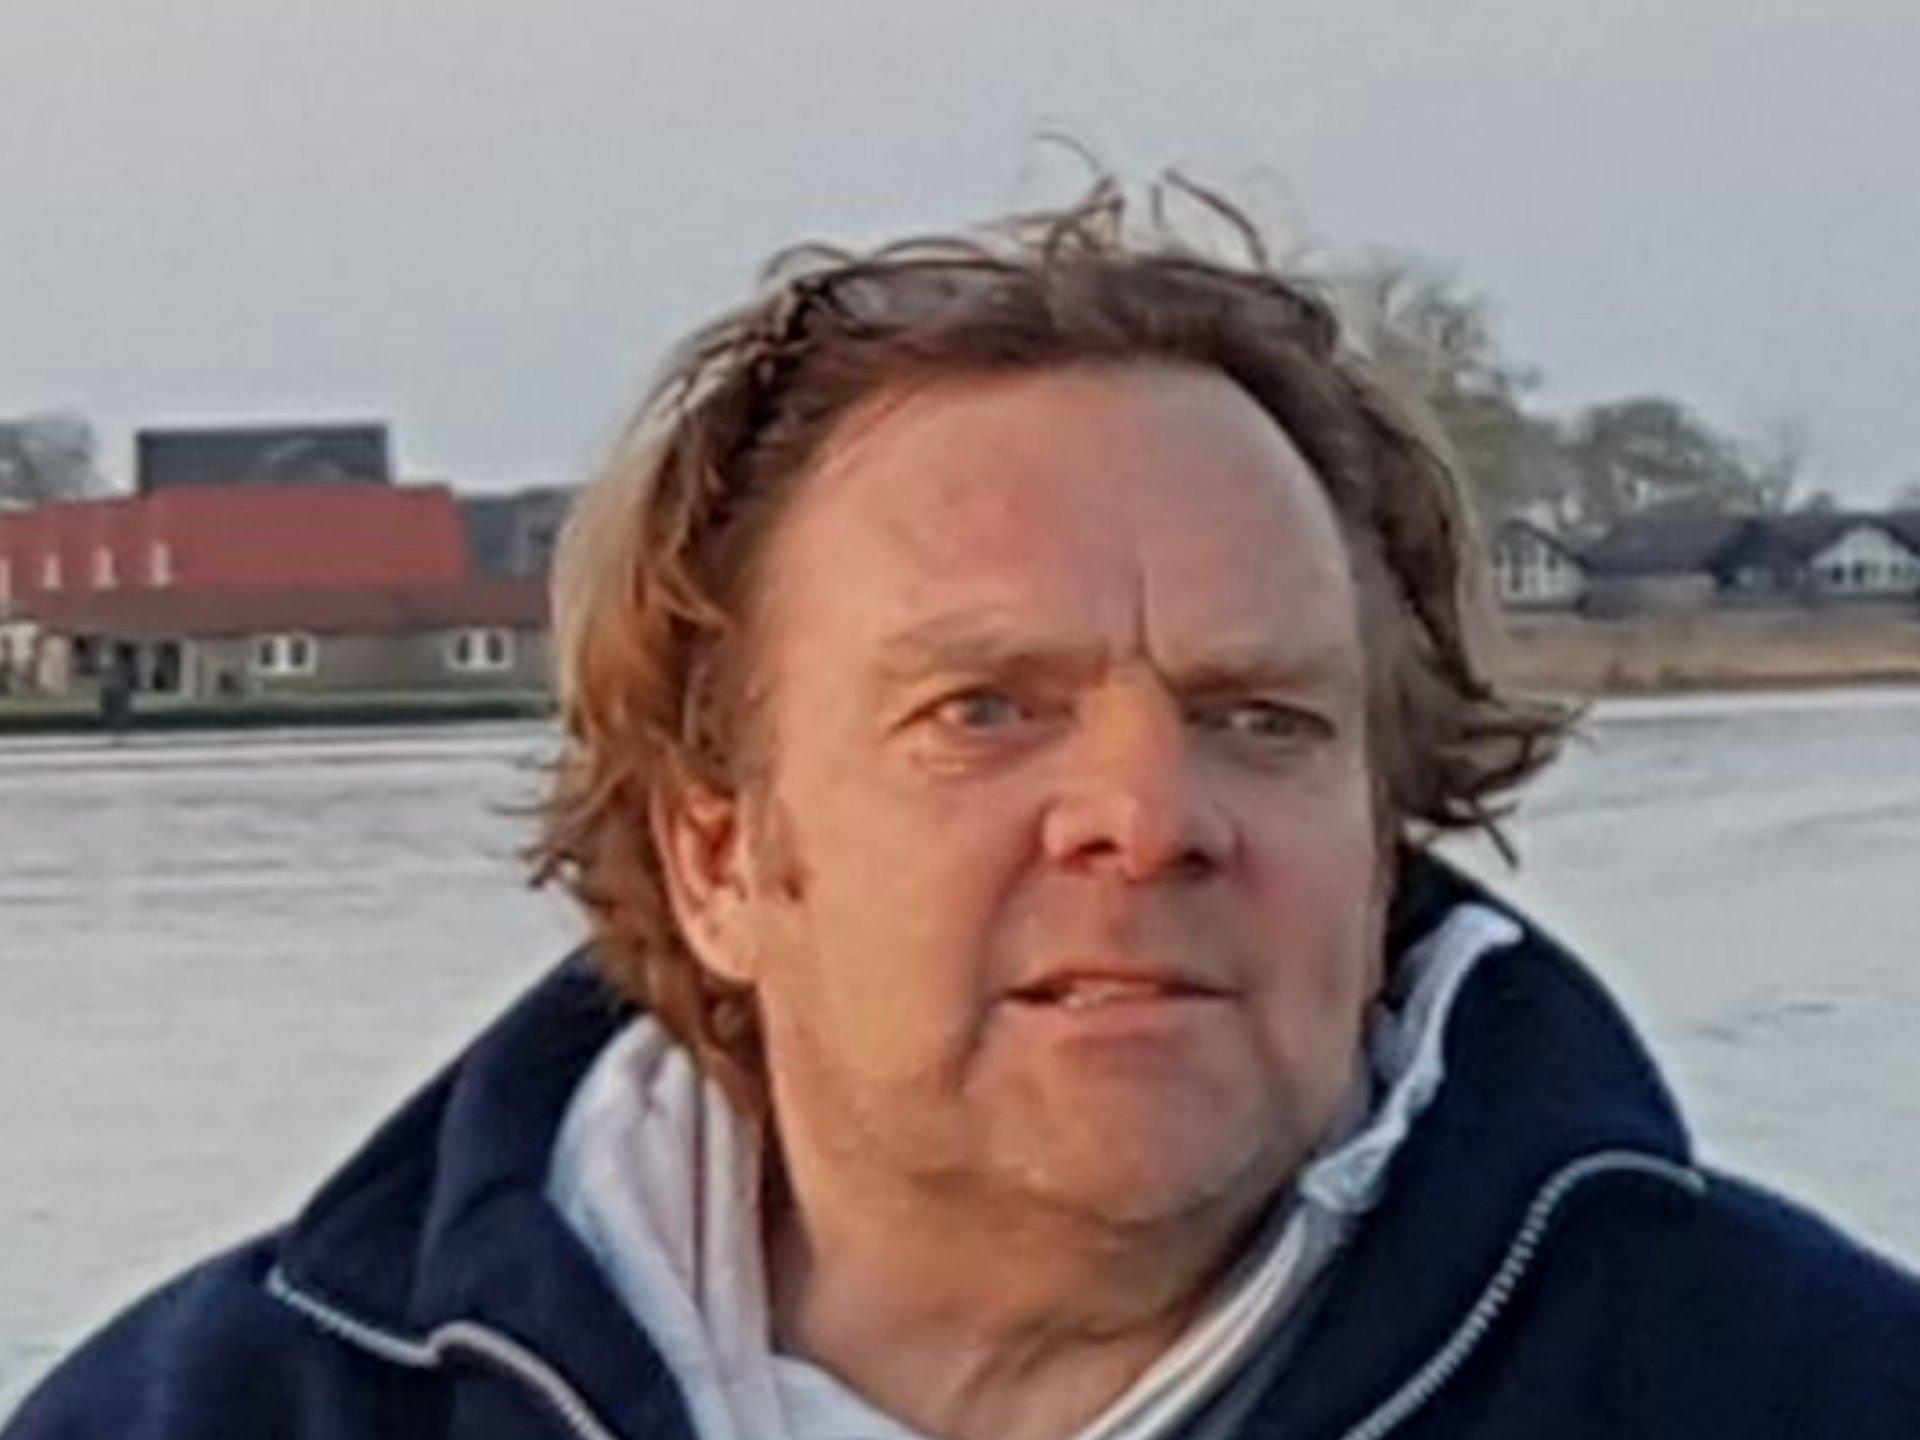 Joostvs2020 uit Friesland,Nederland